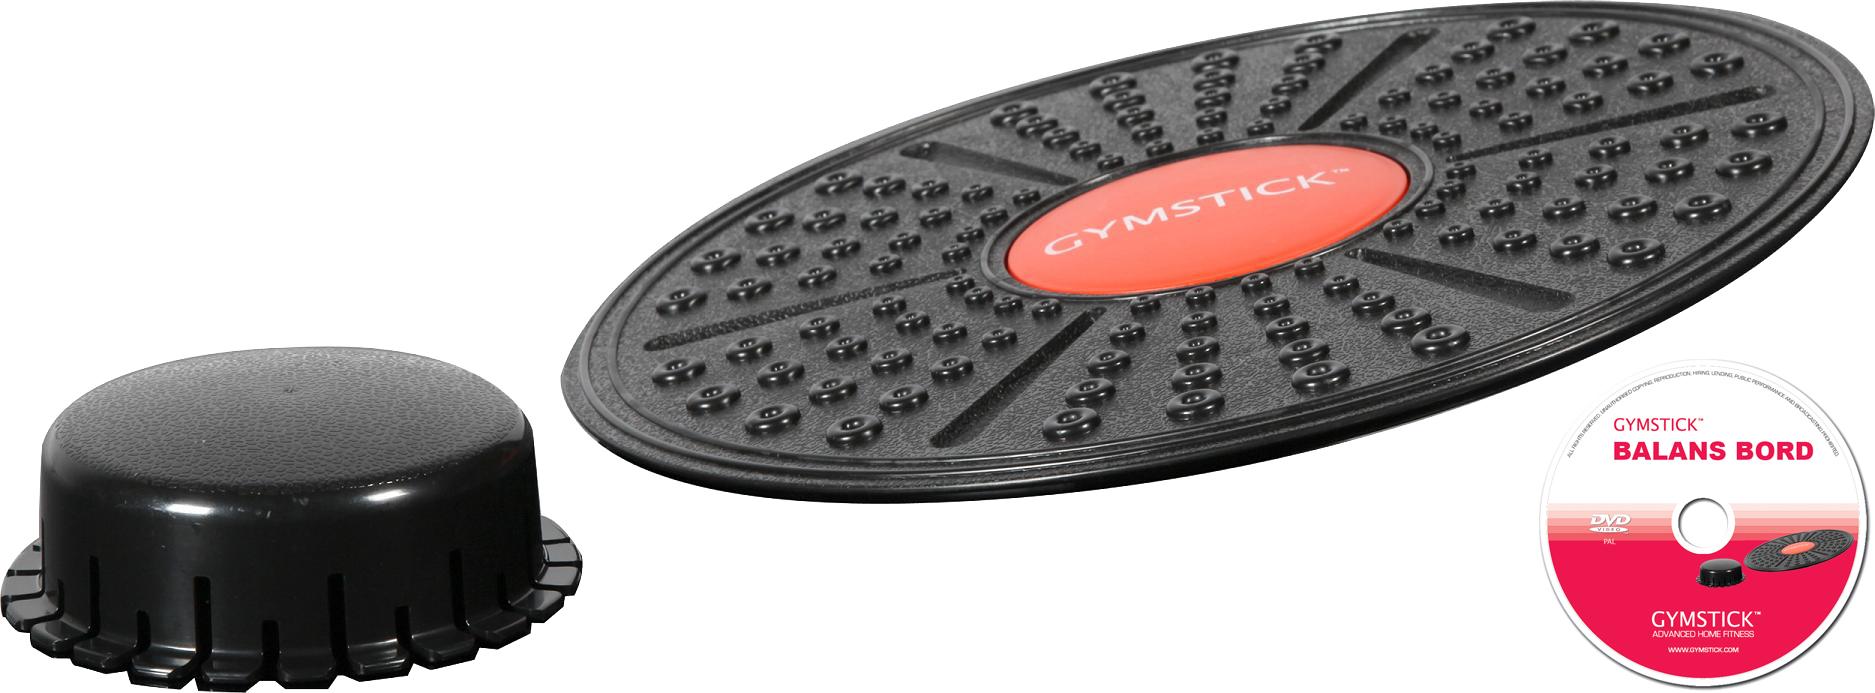 Gymstick balans bord met verstelbare hoogte + DVD